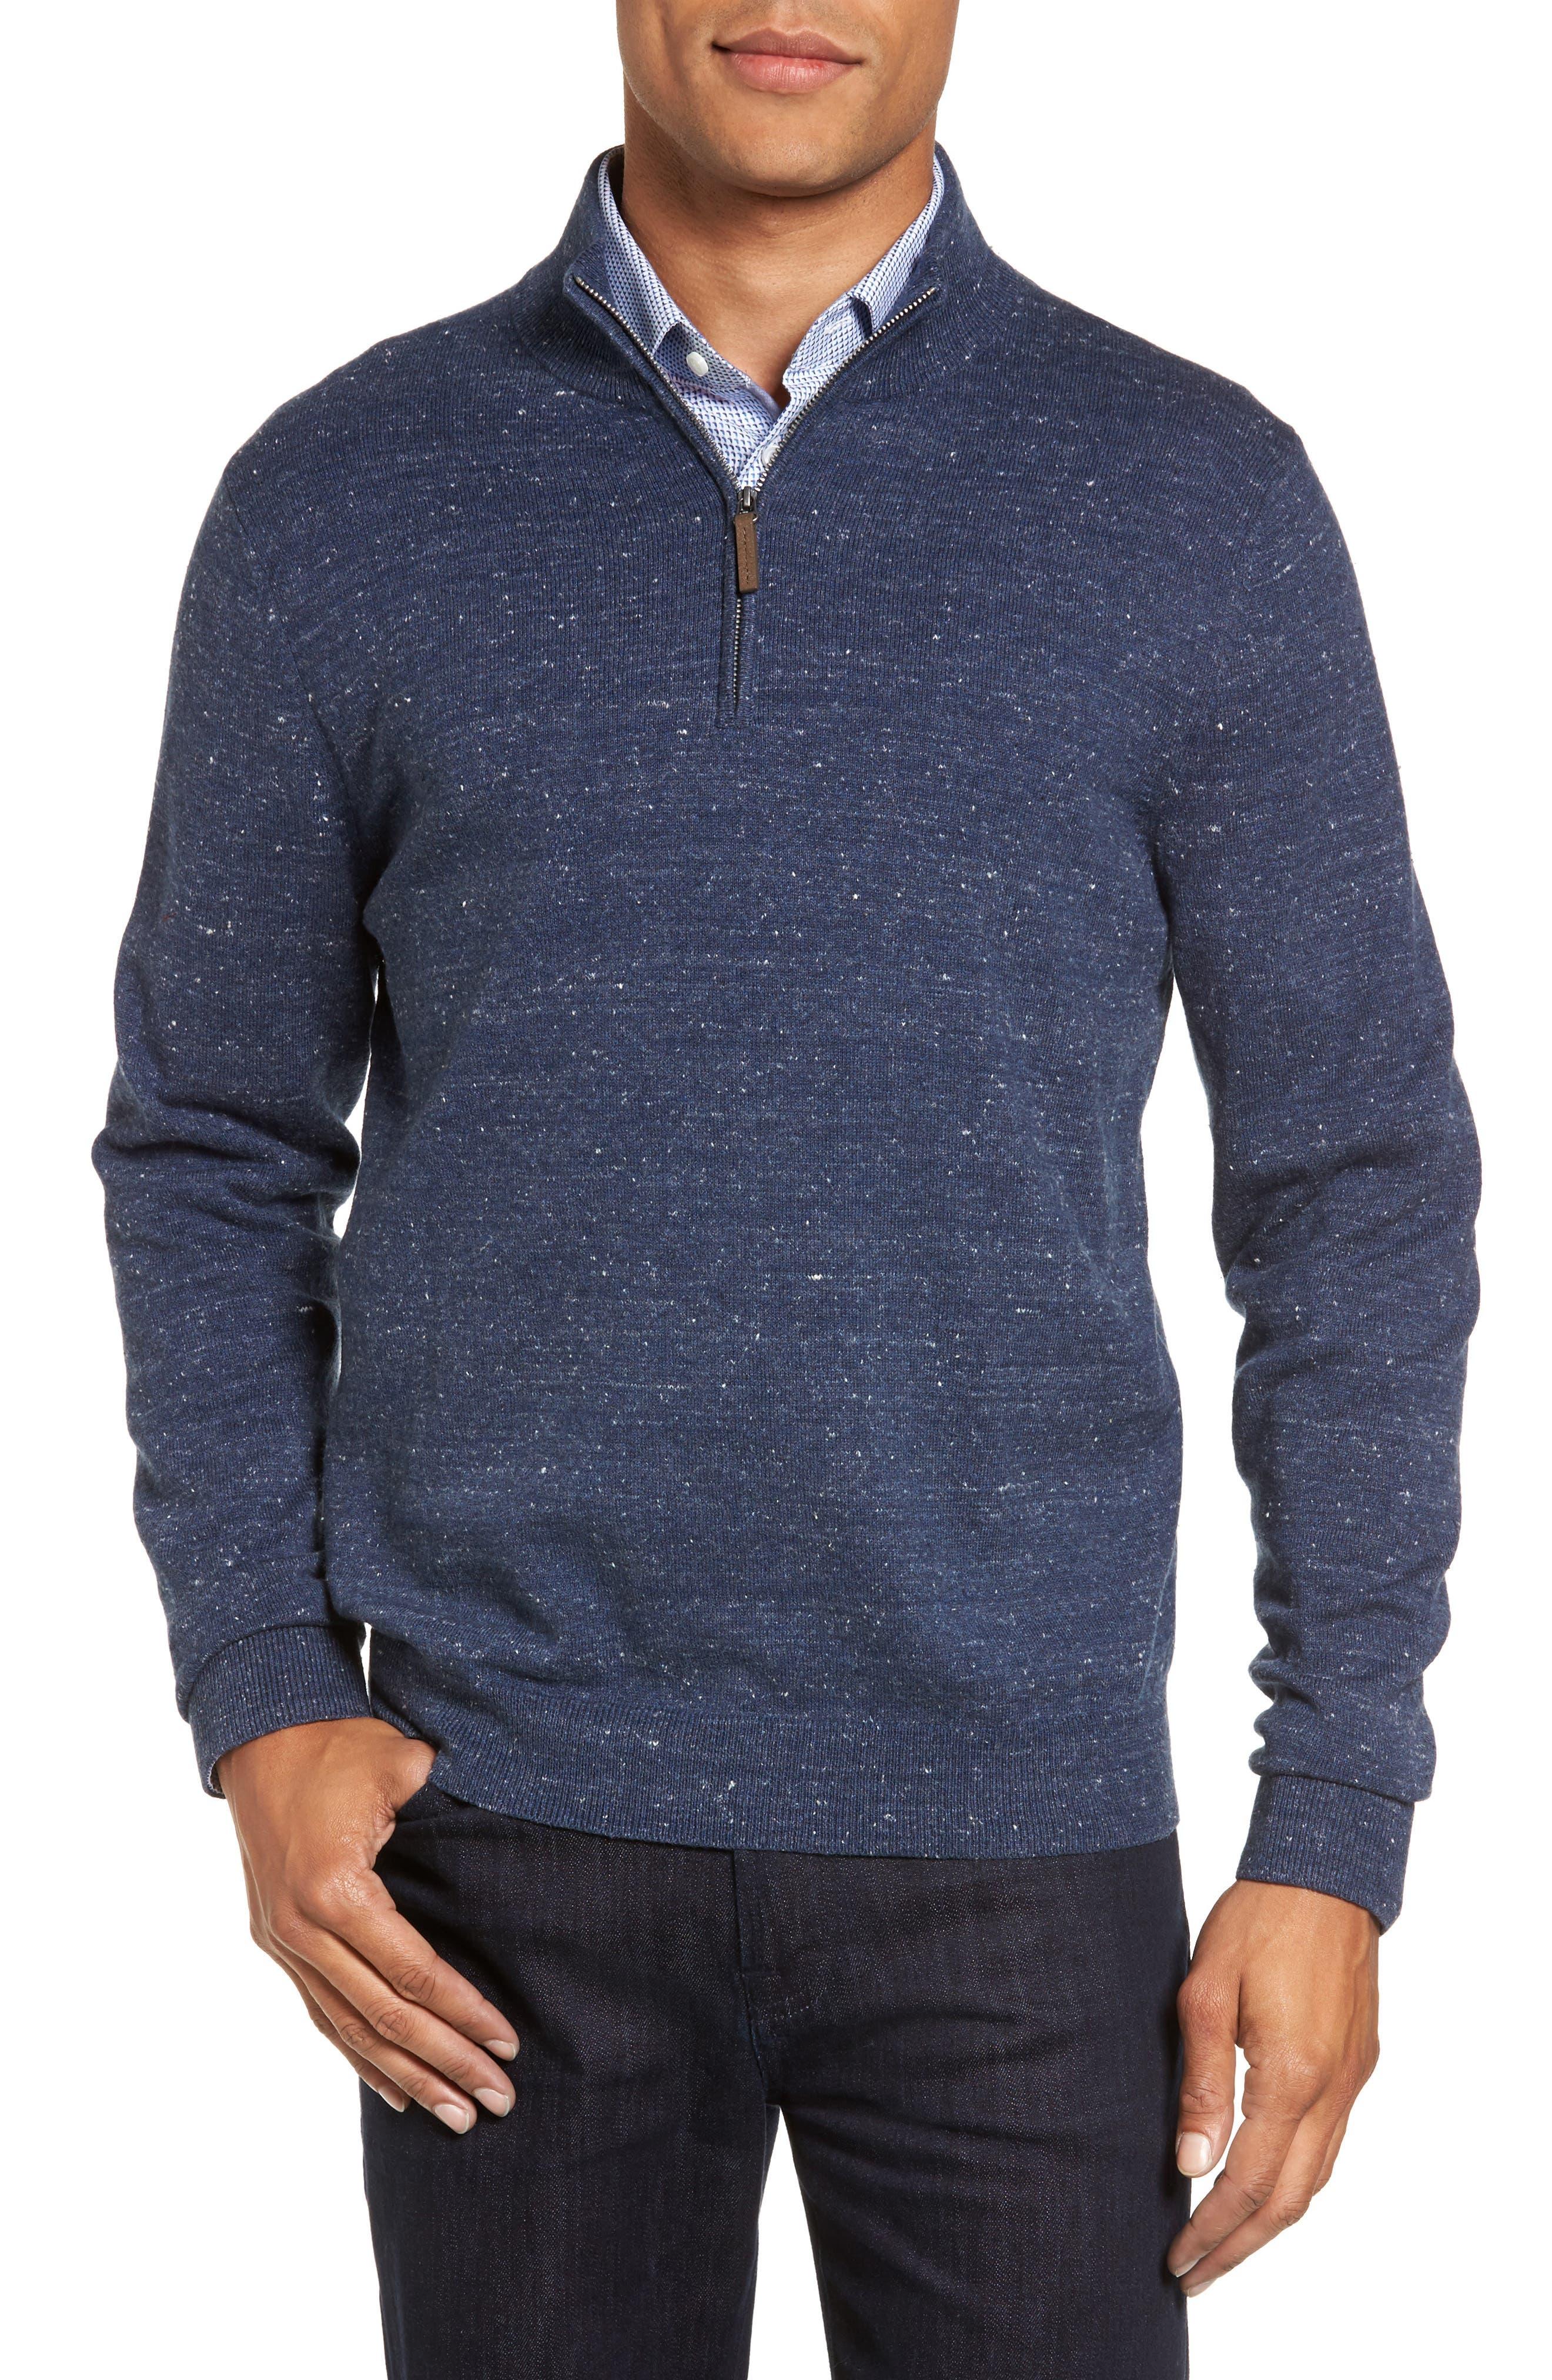 Quarter Zip Sweater,                             Main thumbnail 1, color,                             Blue Twilight Marl